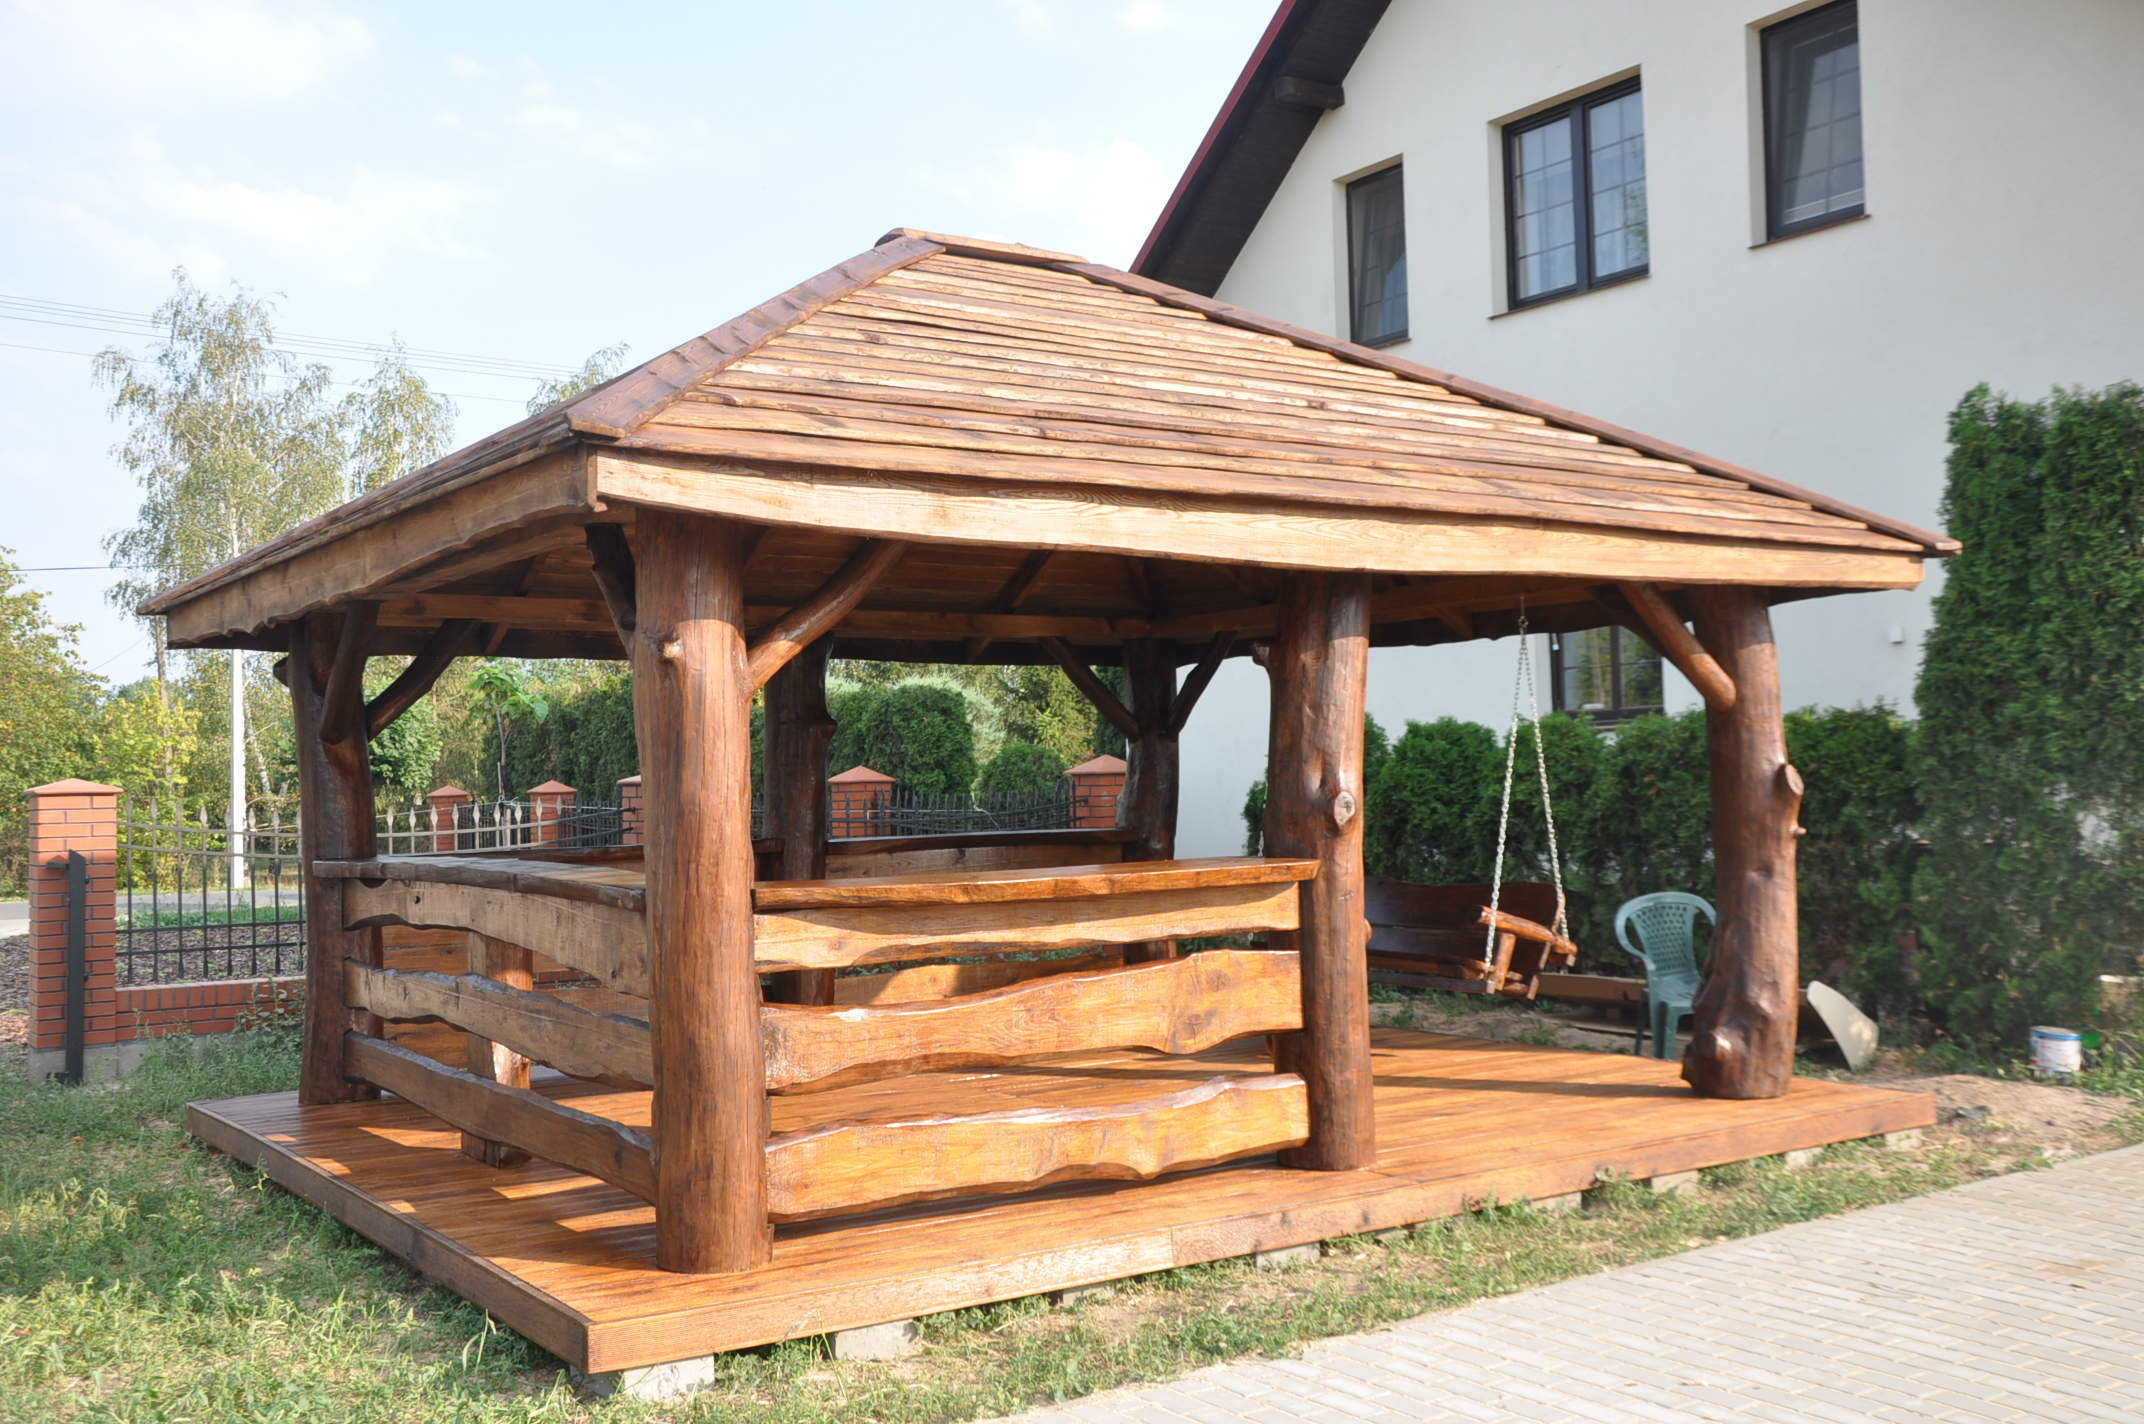 altana drewniana kryta deską